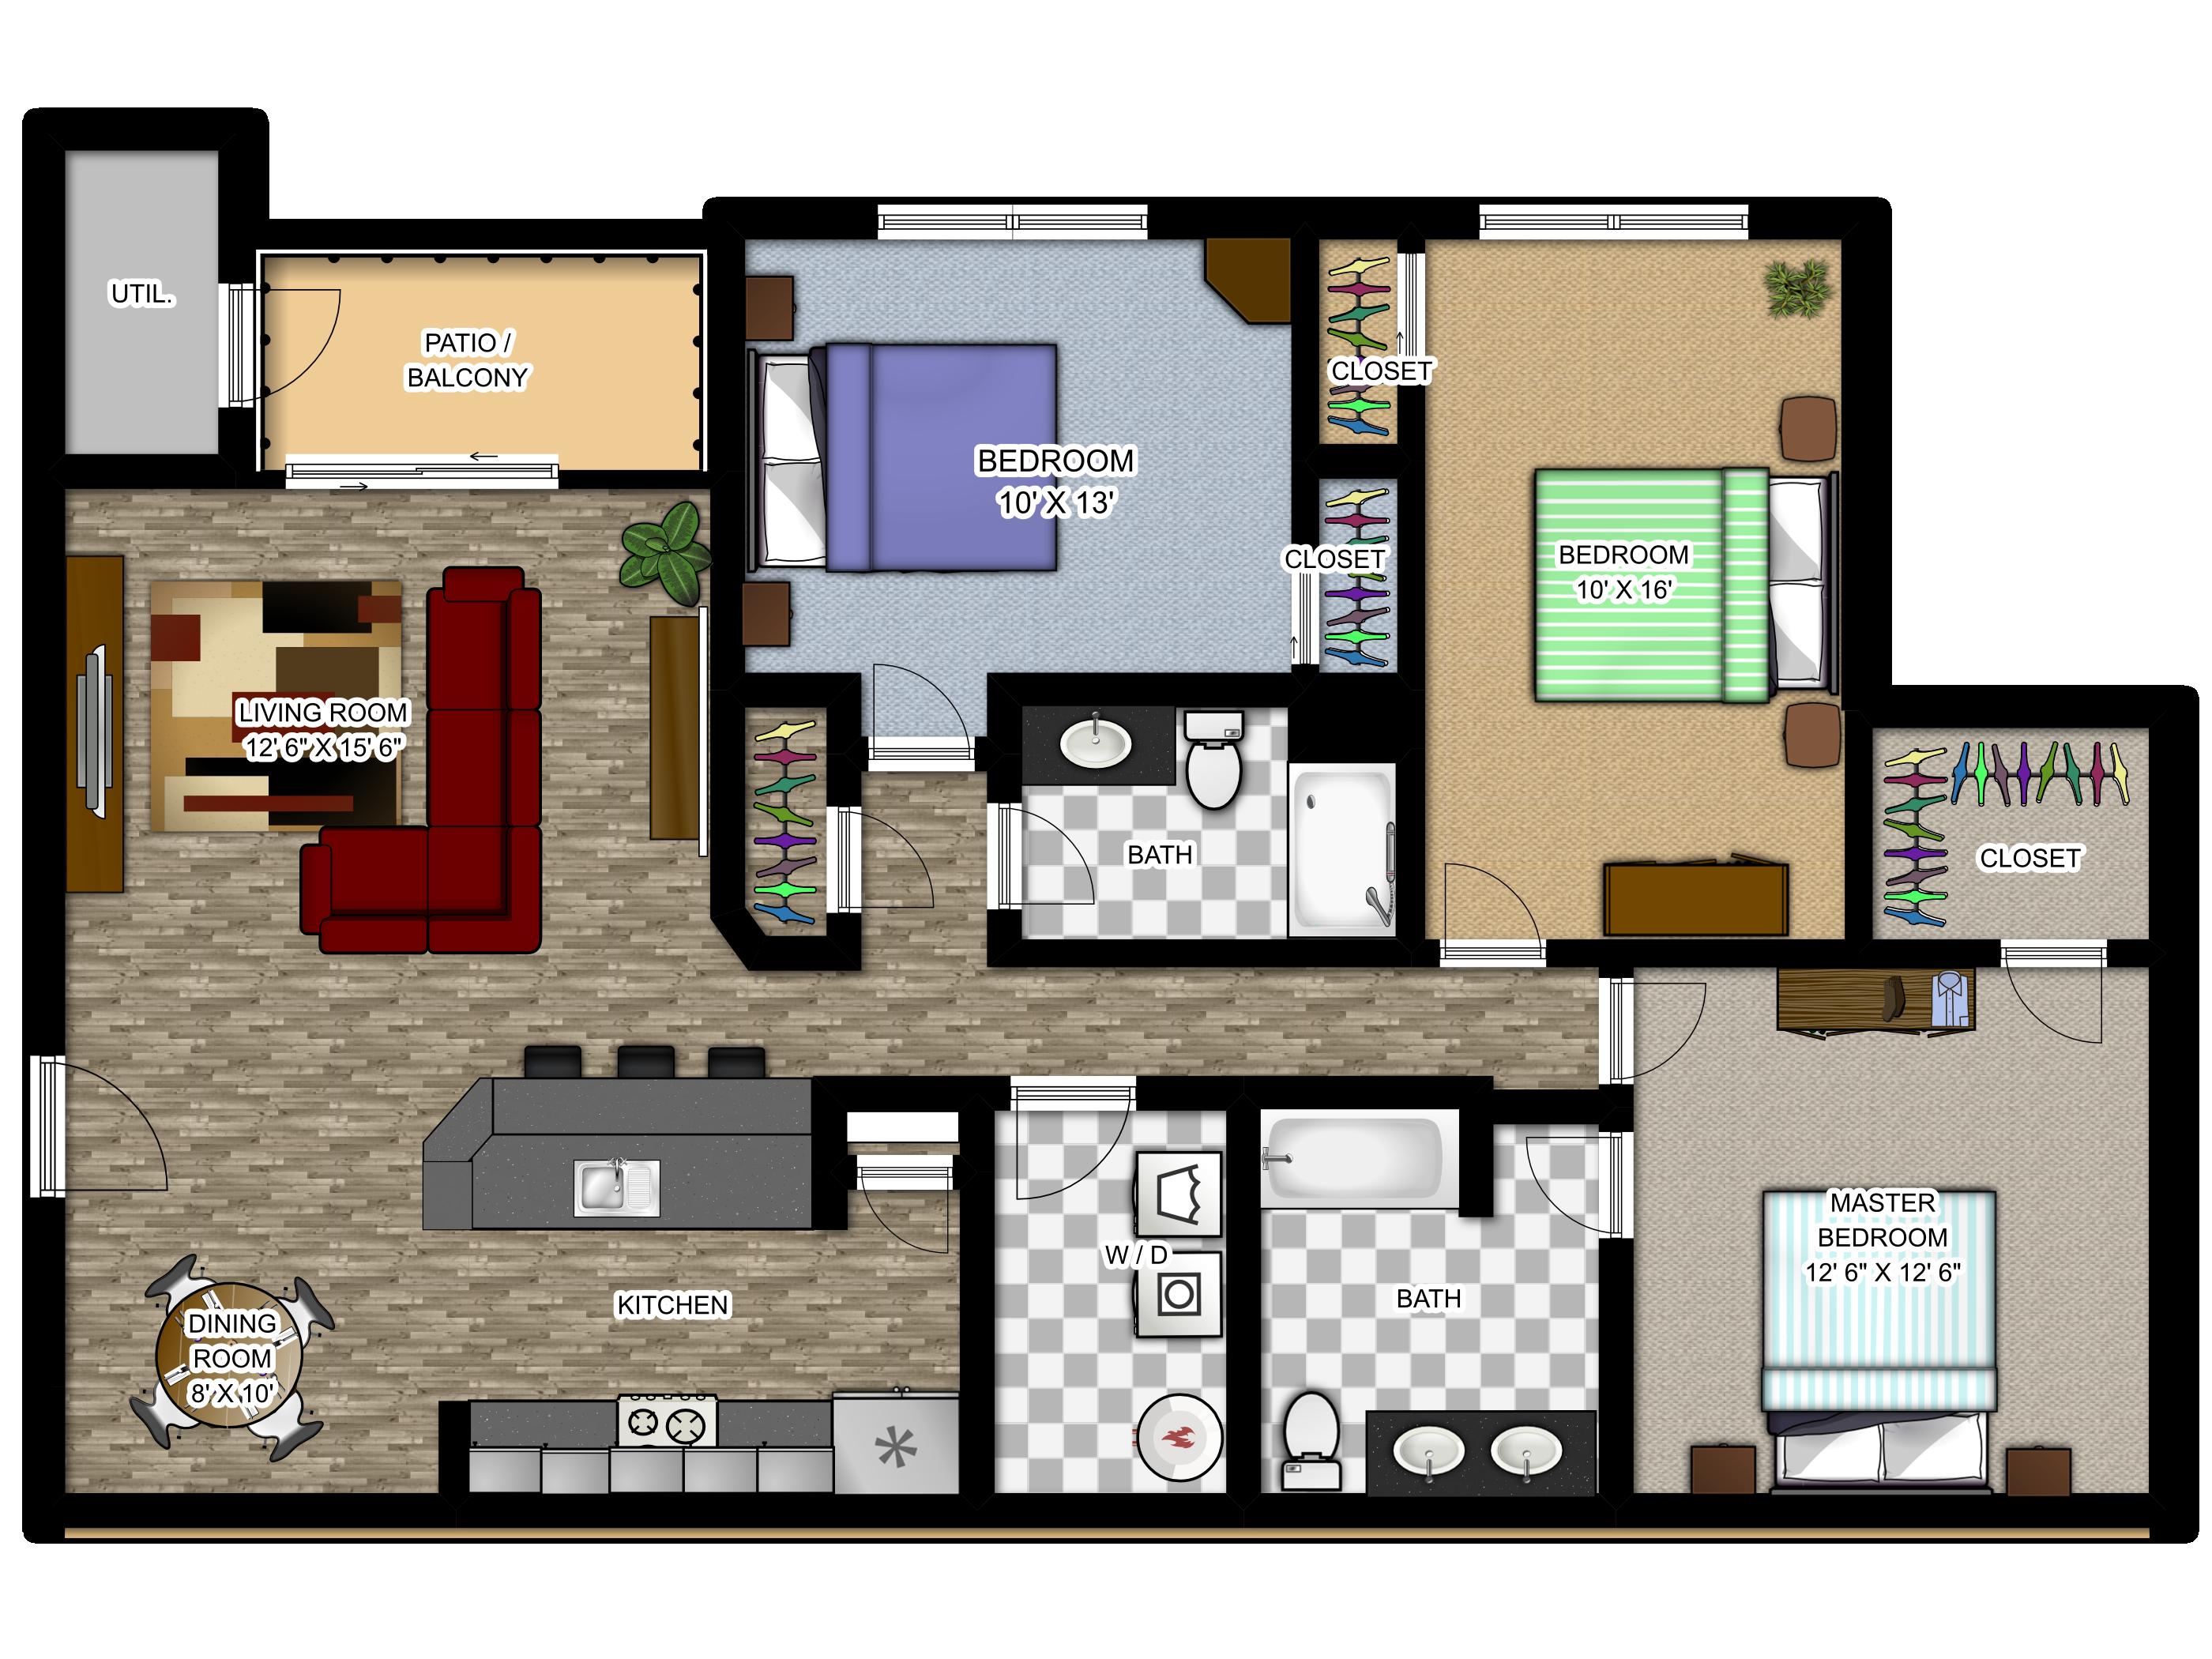 Meadowood Apartments Floor Plans - The Cahteau